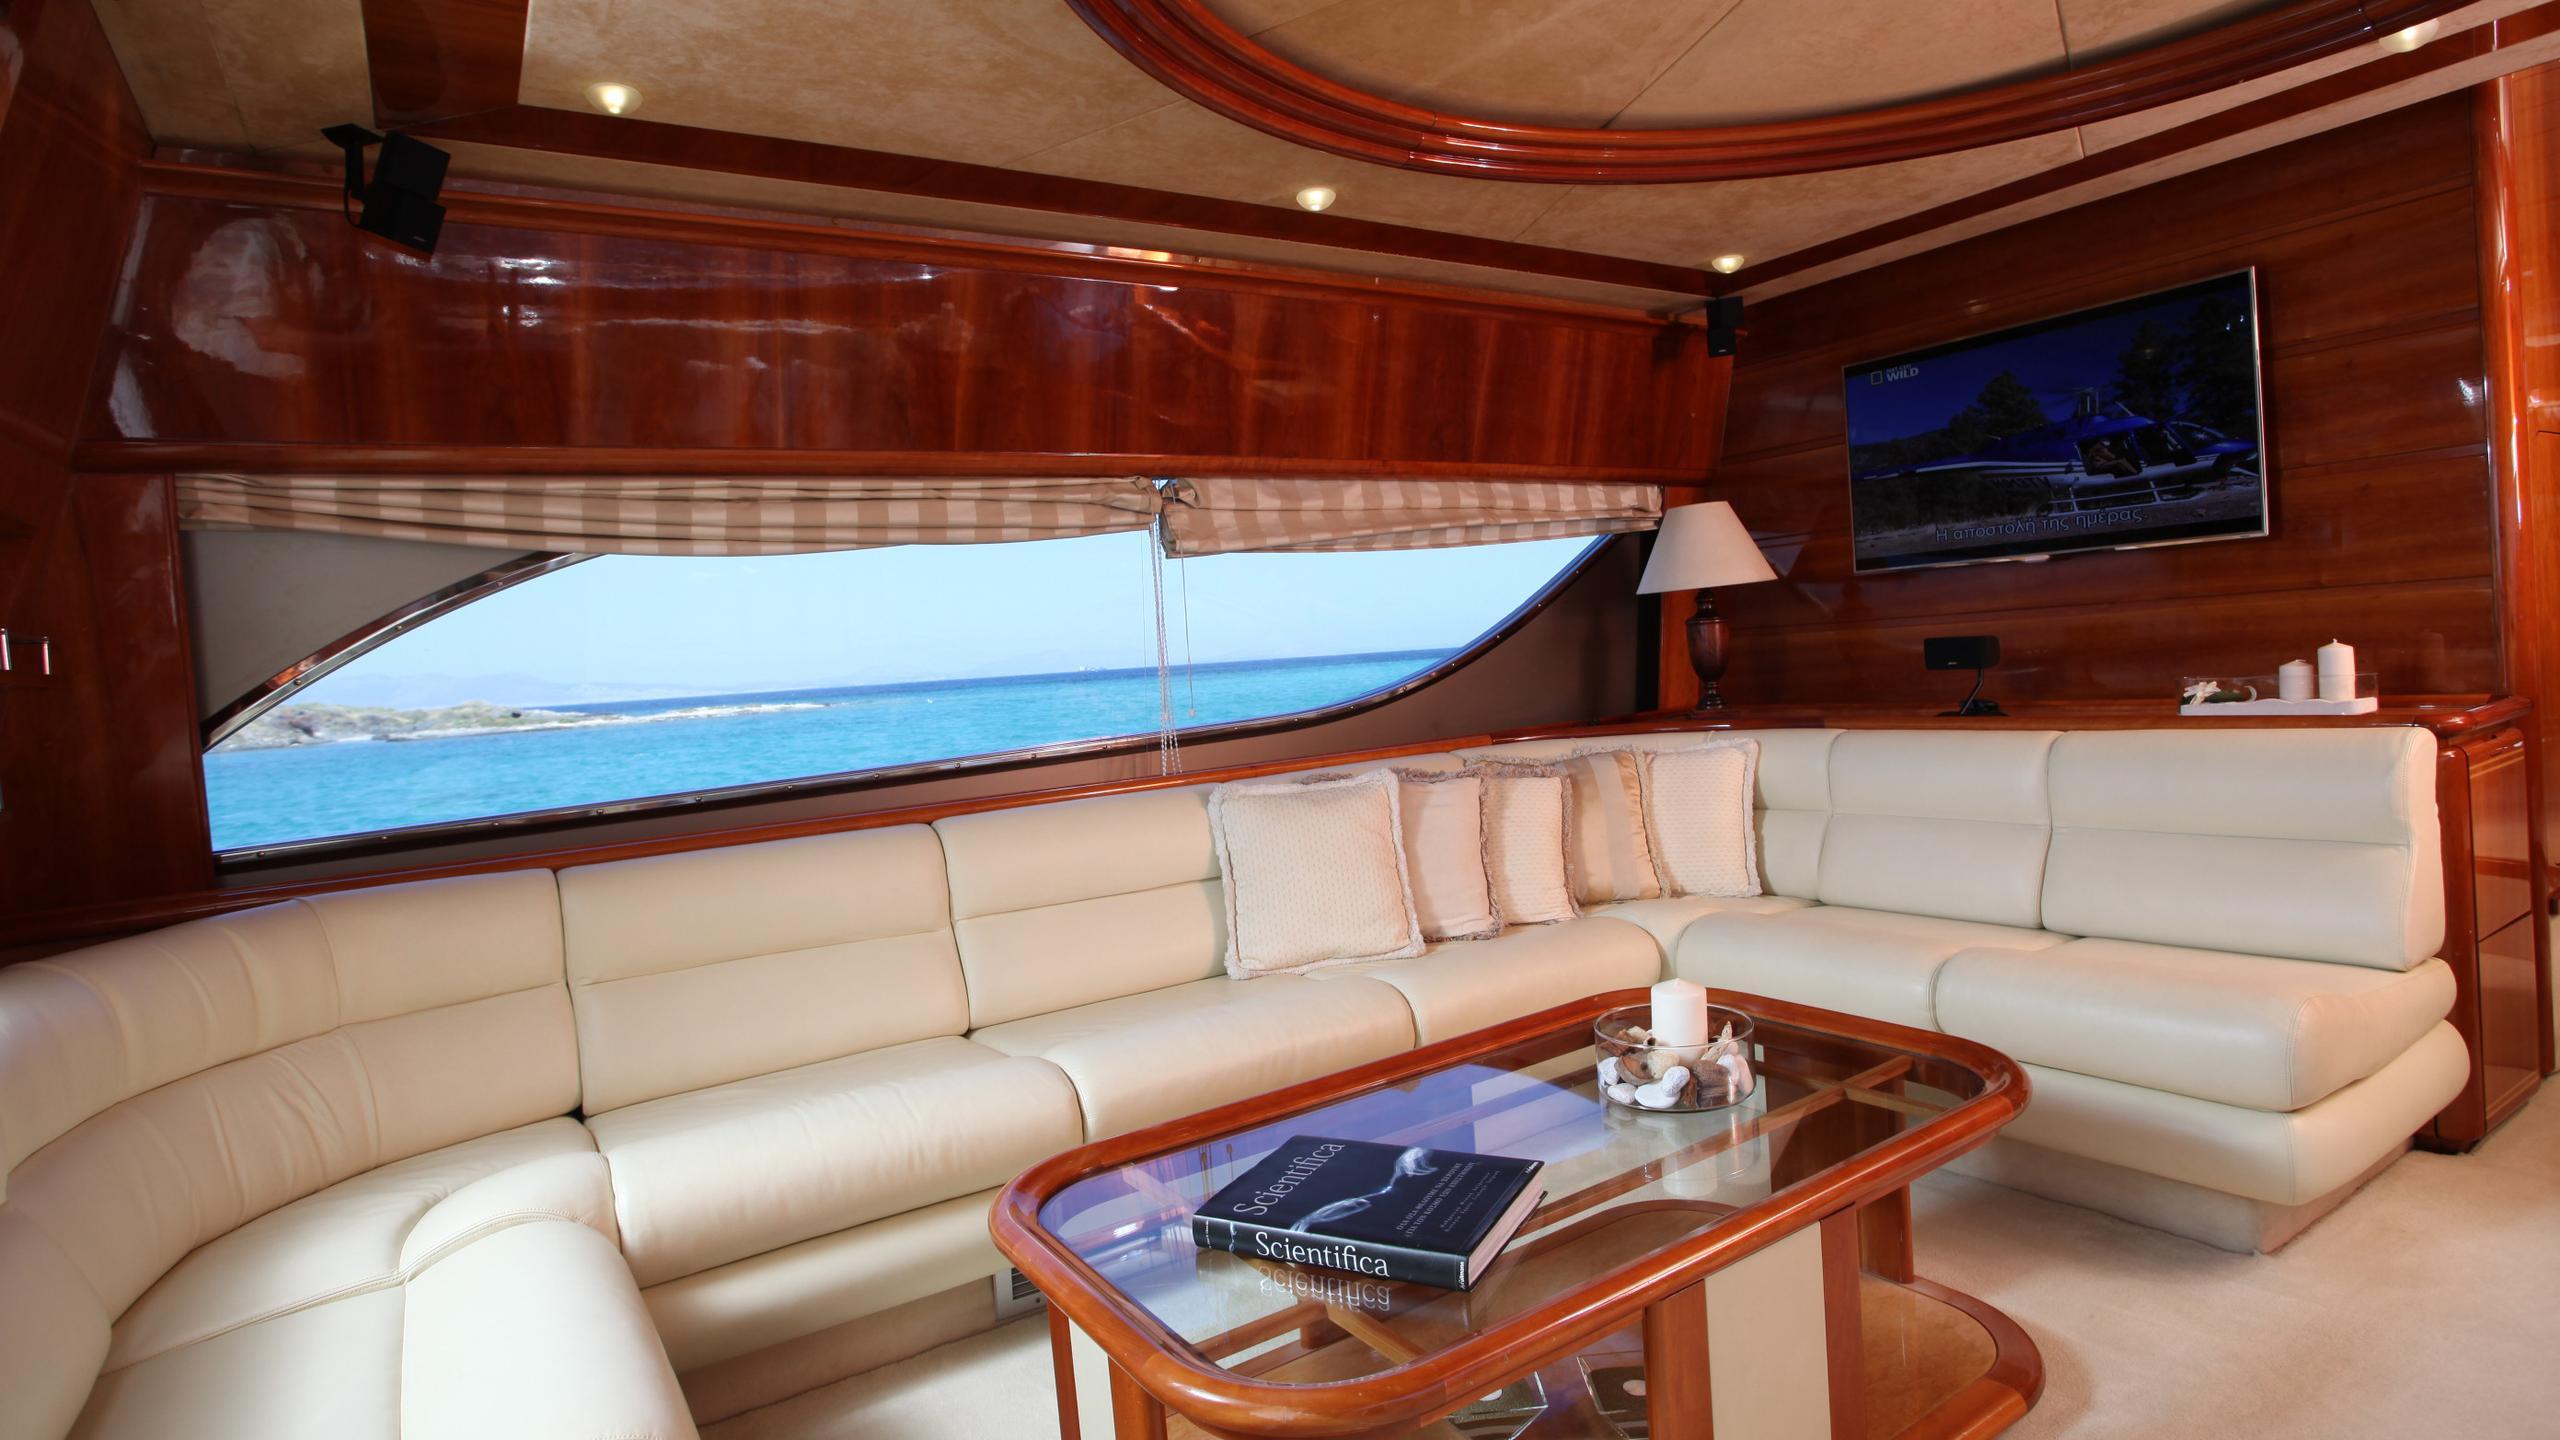 kentavros-ii-yacht-saloon